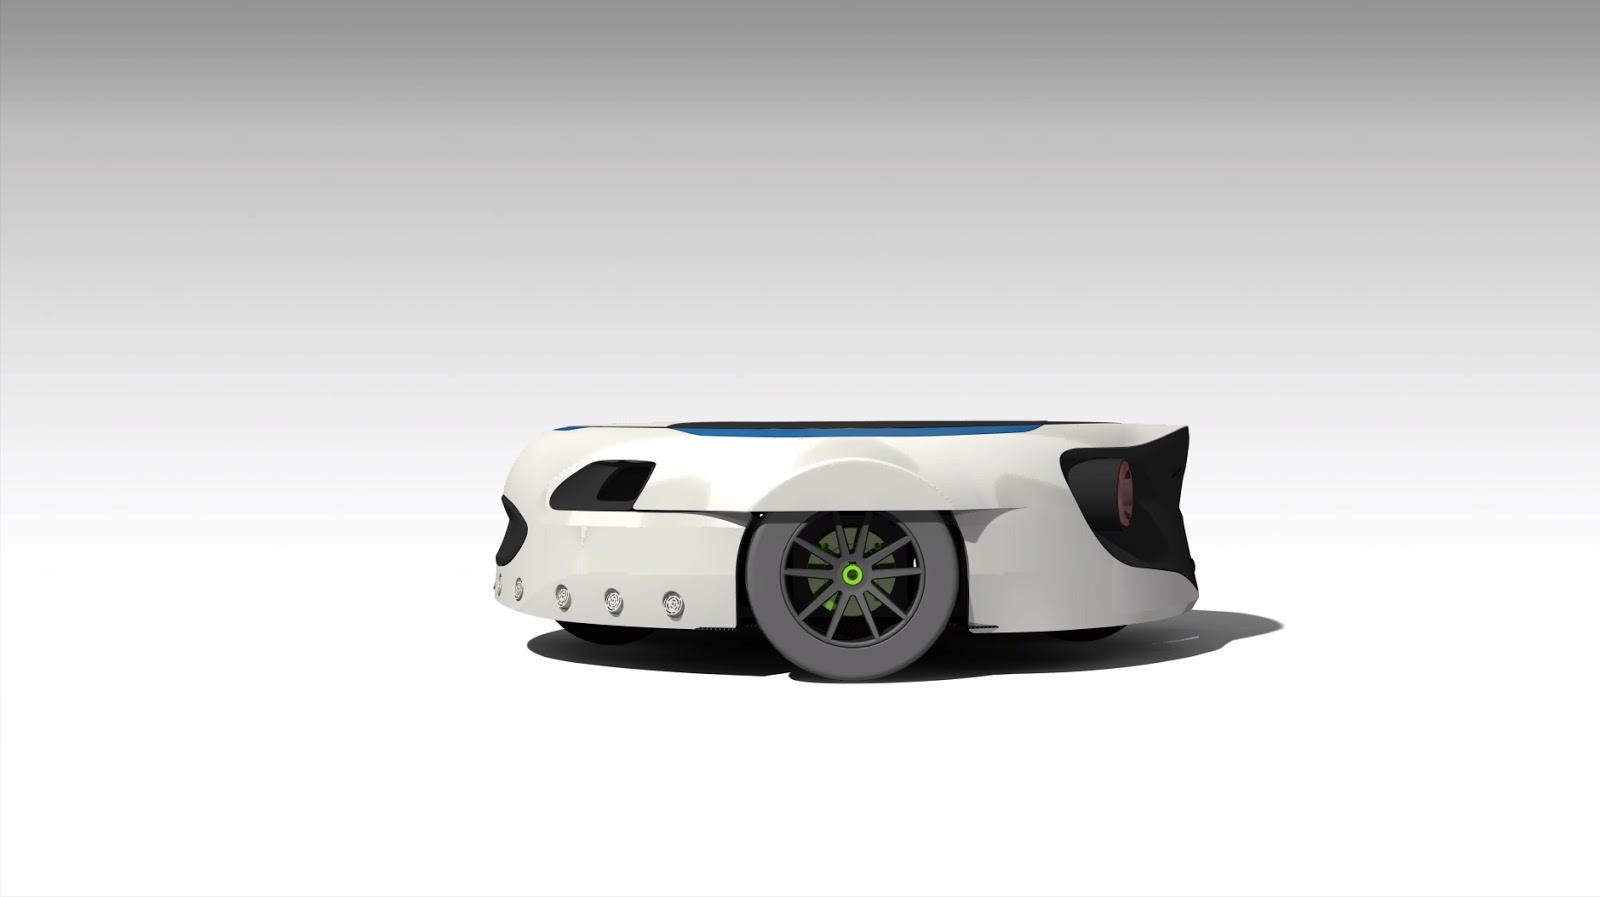 R9 Carr-E : Η ατομική πλατφόρμα μετακίνησης σε σχήμα και μέγεθος ρεζέρβας! Carr-E, Electric cars, Ford, videos, Τεχνολογία